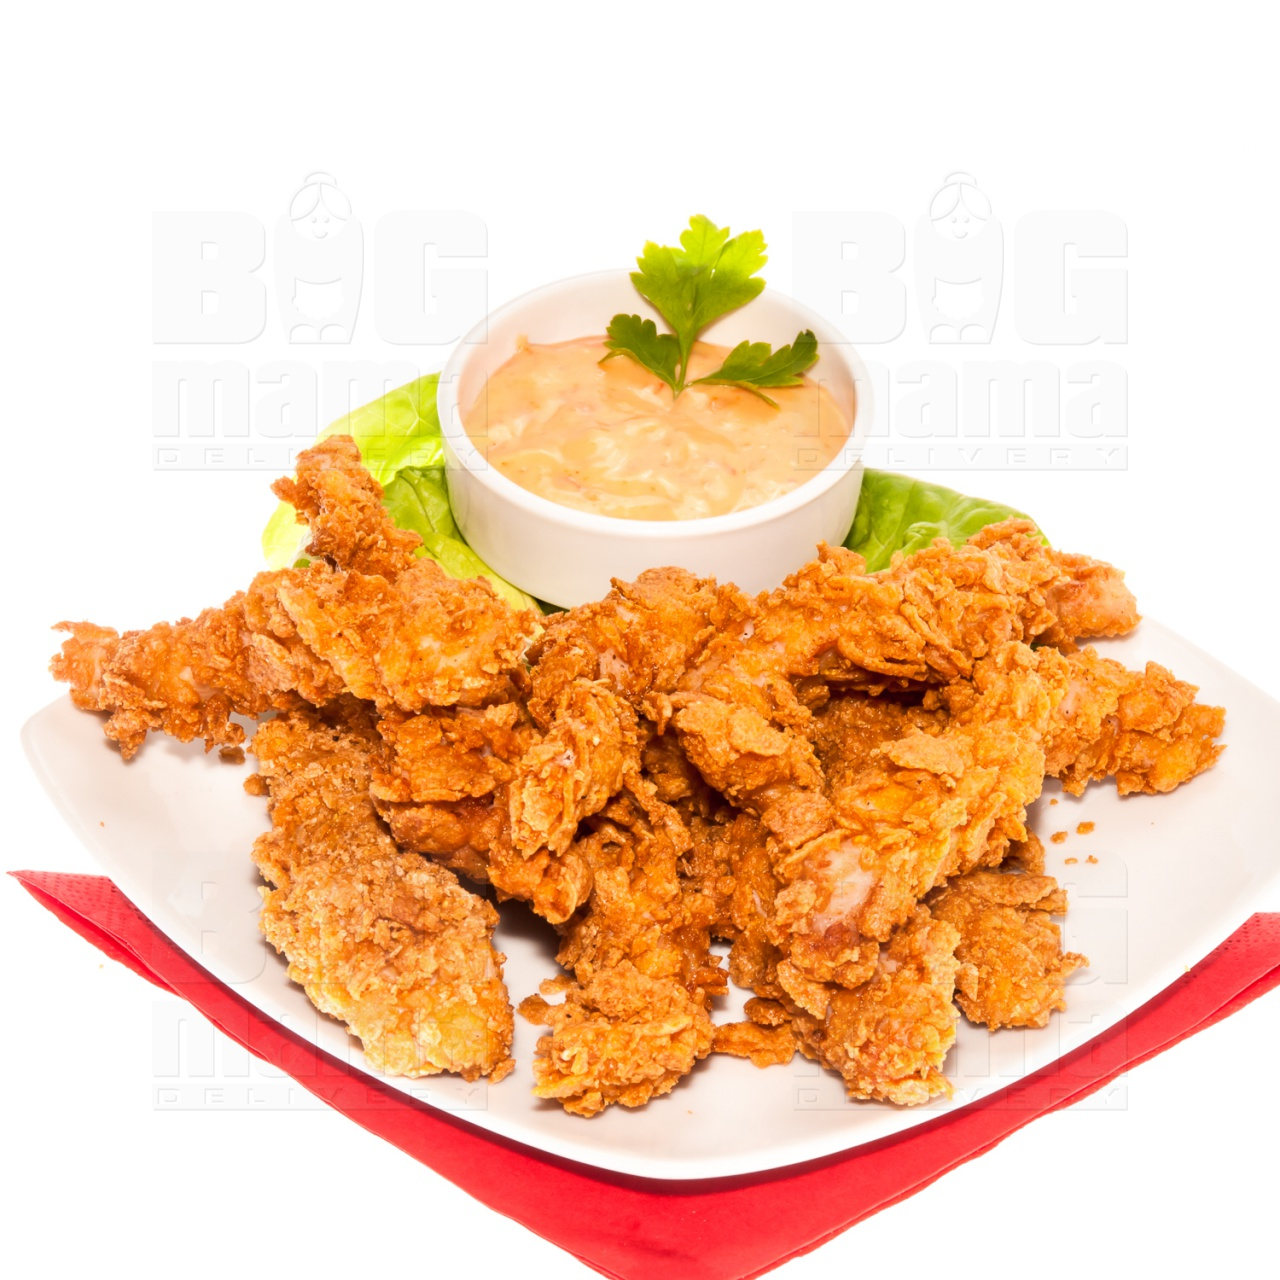 Product #189 image - Crispy chicken cu sos, 1/2 porție